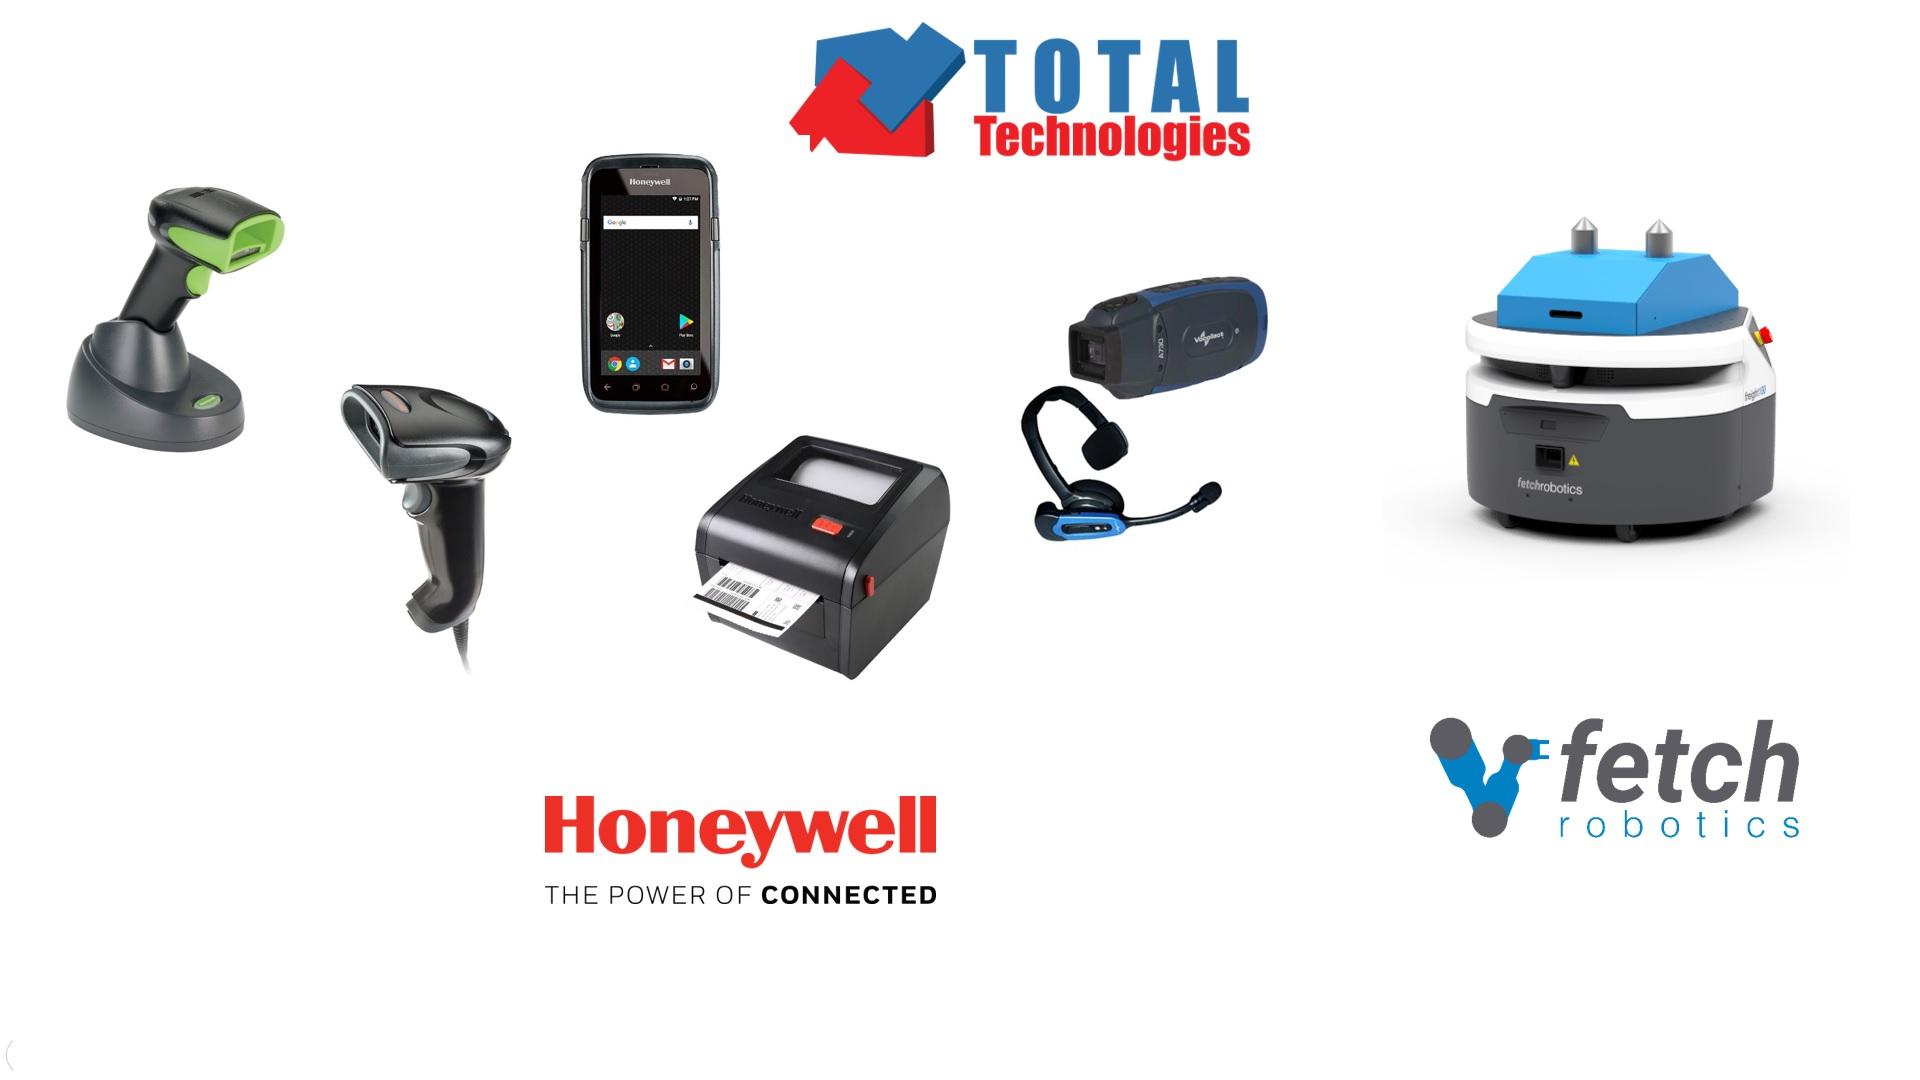 #TotalTechnologies & #Honeywell prezent la GoTech Romexpo, 2-3 Octombrie!